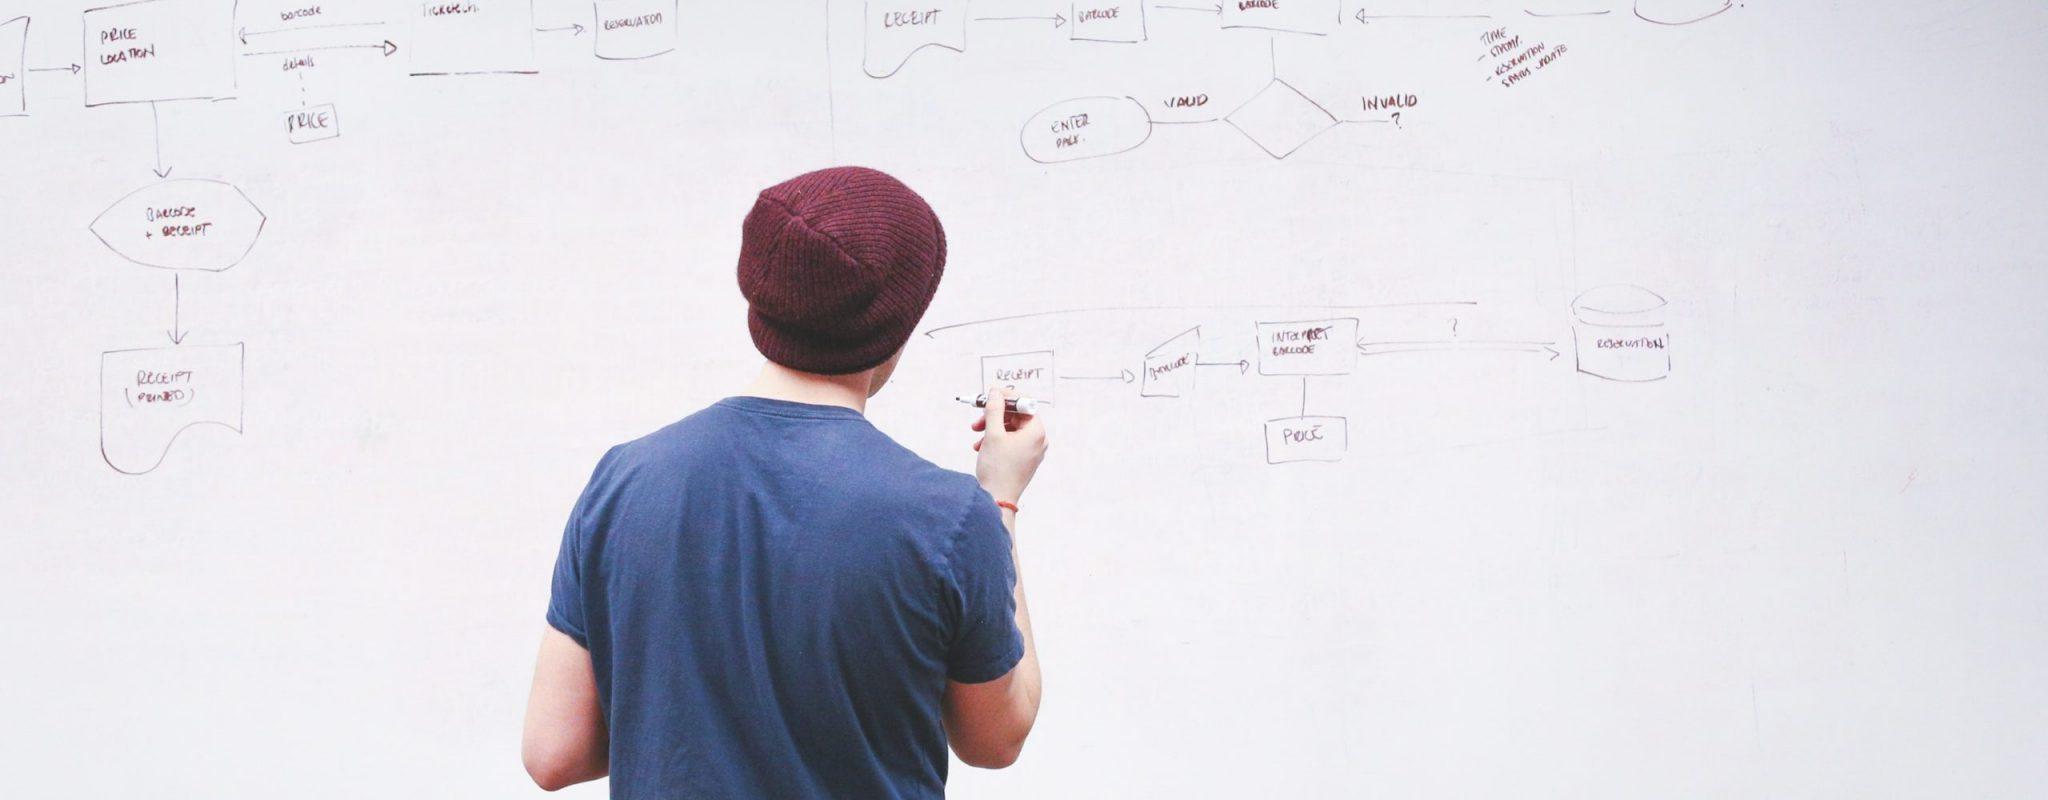 blog topic brainstorm